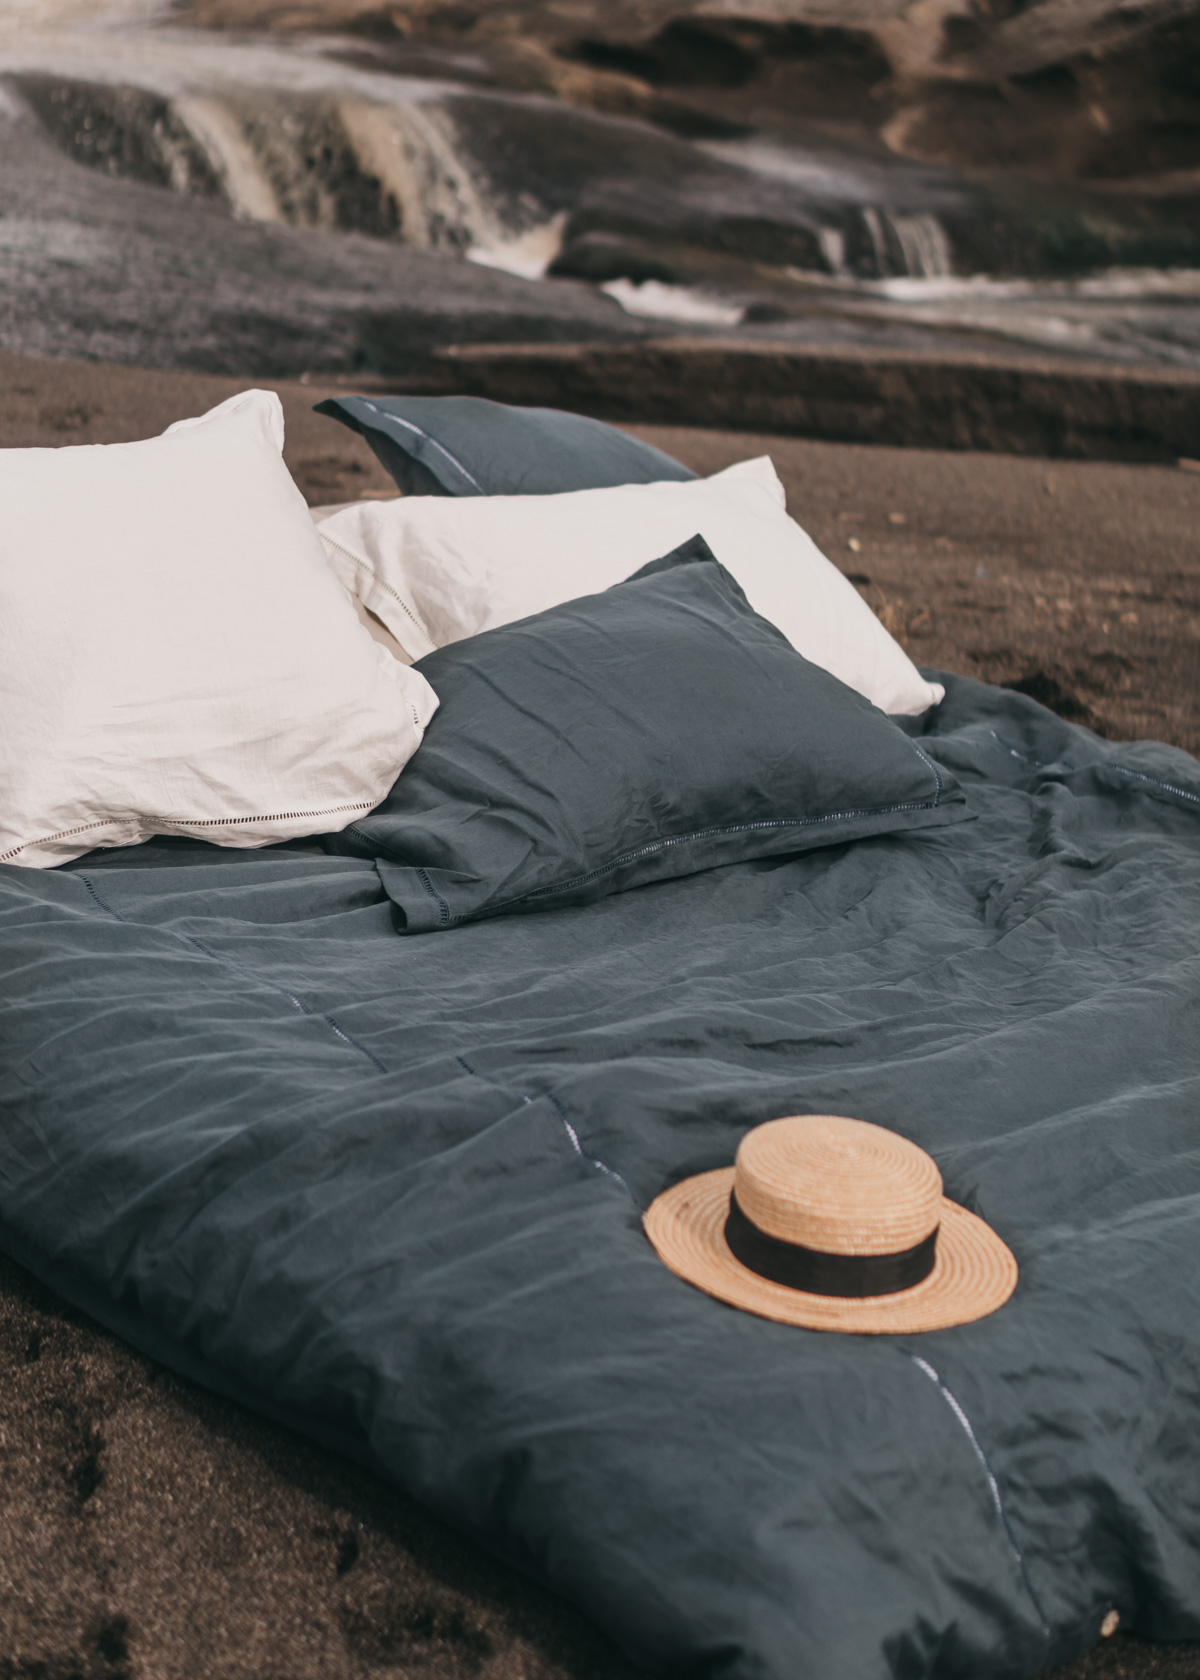 Keira-Mason-in-between-the-sheets-sleeping-beachside.jpg